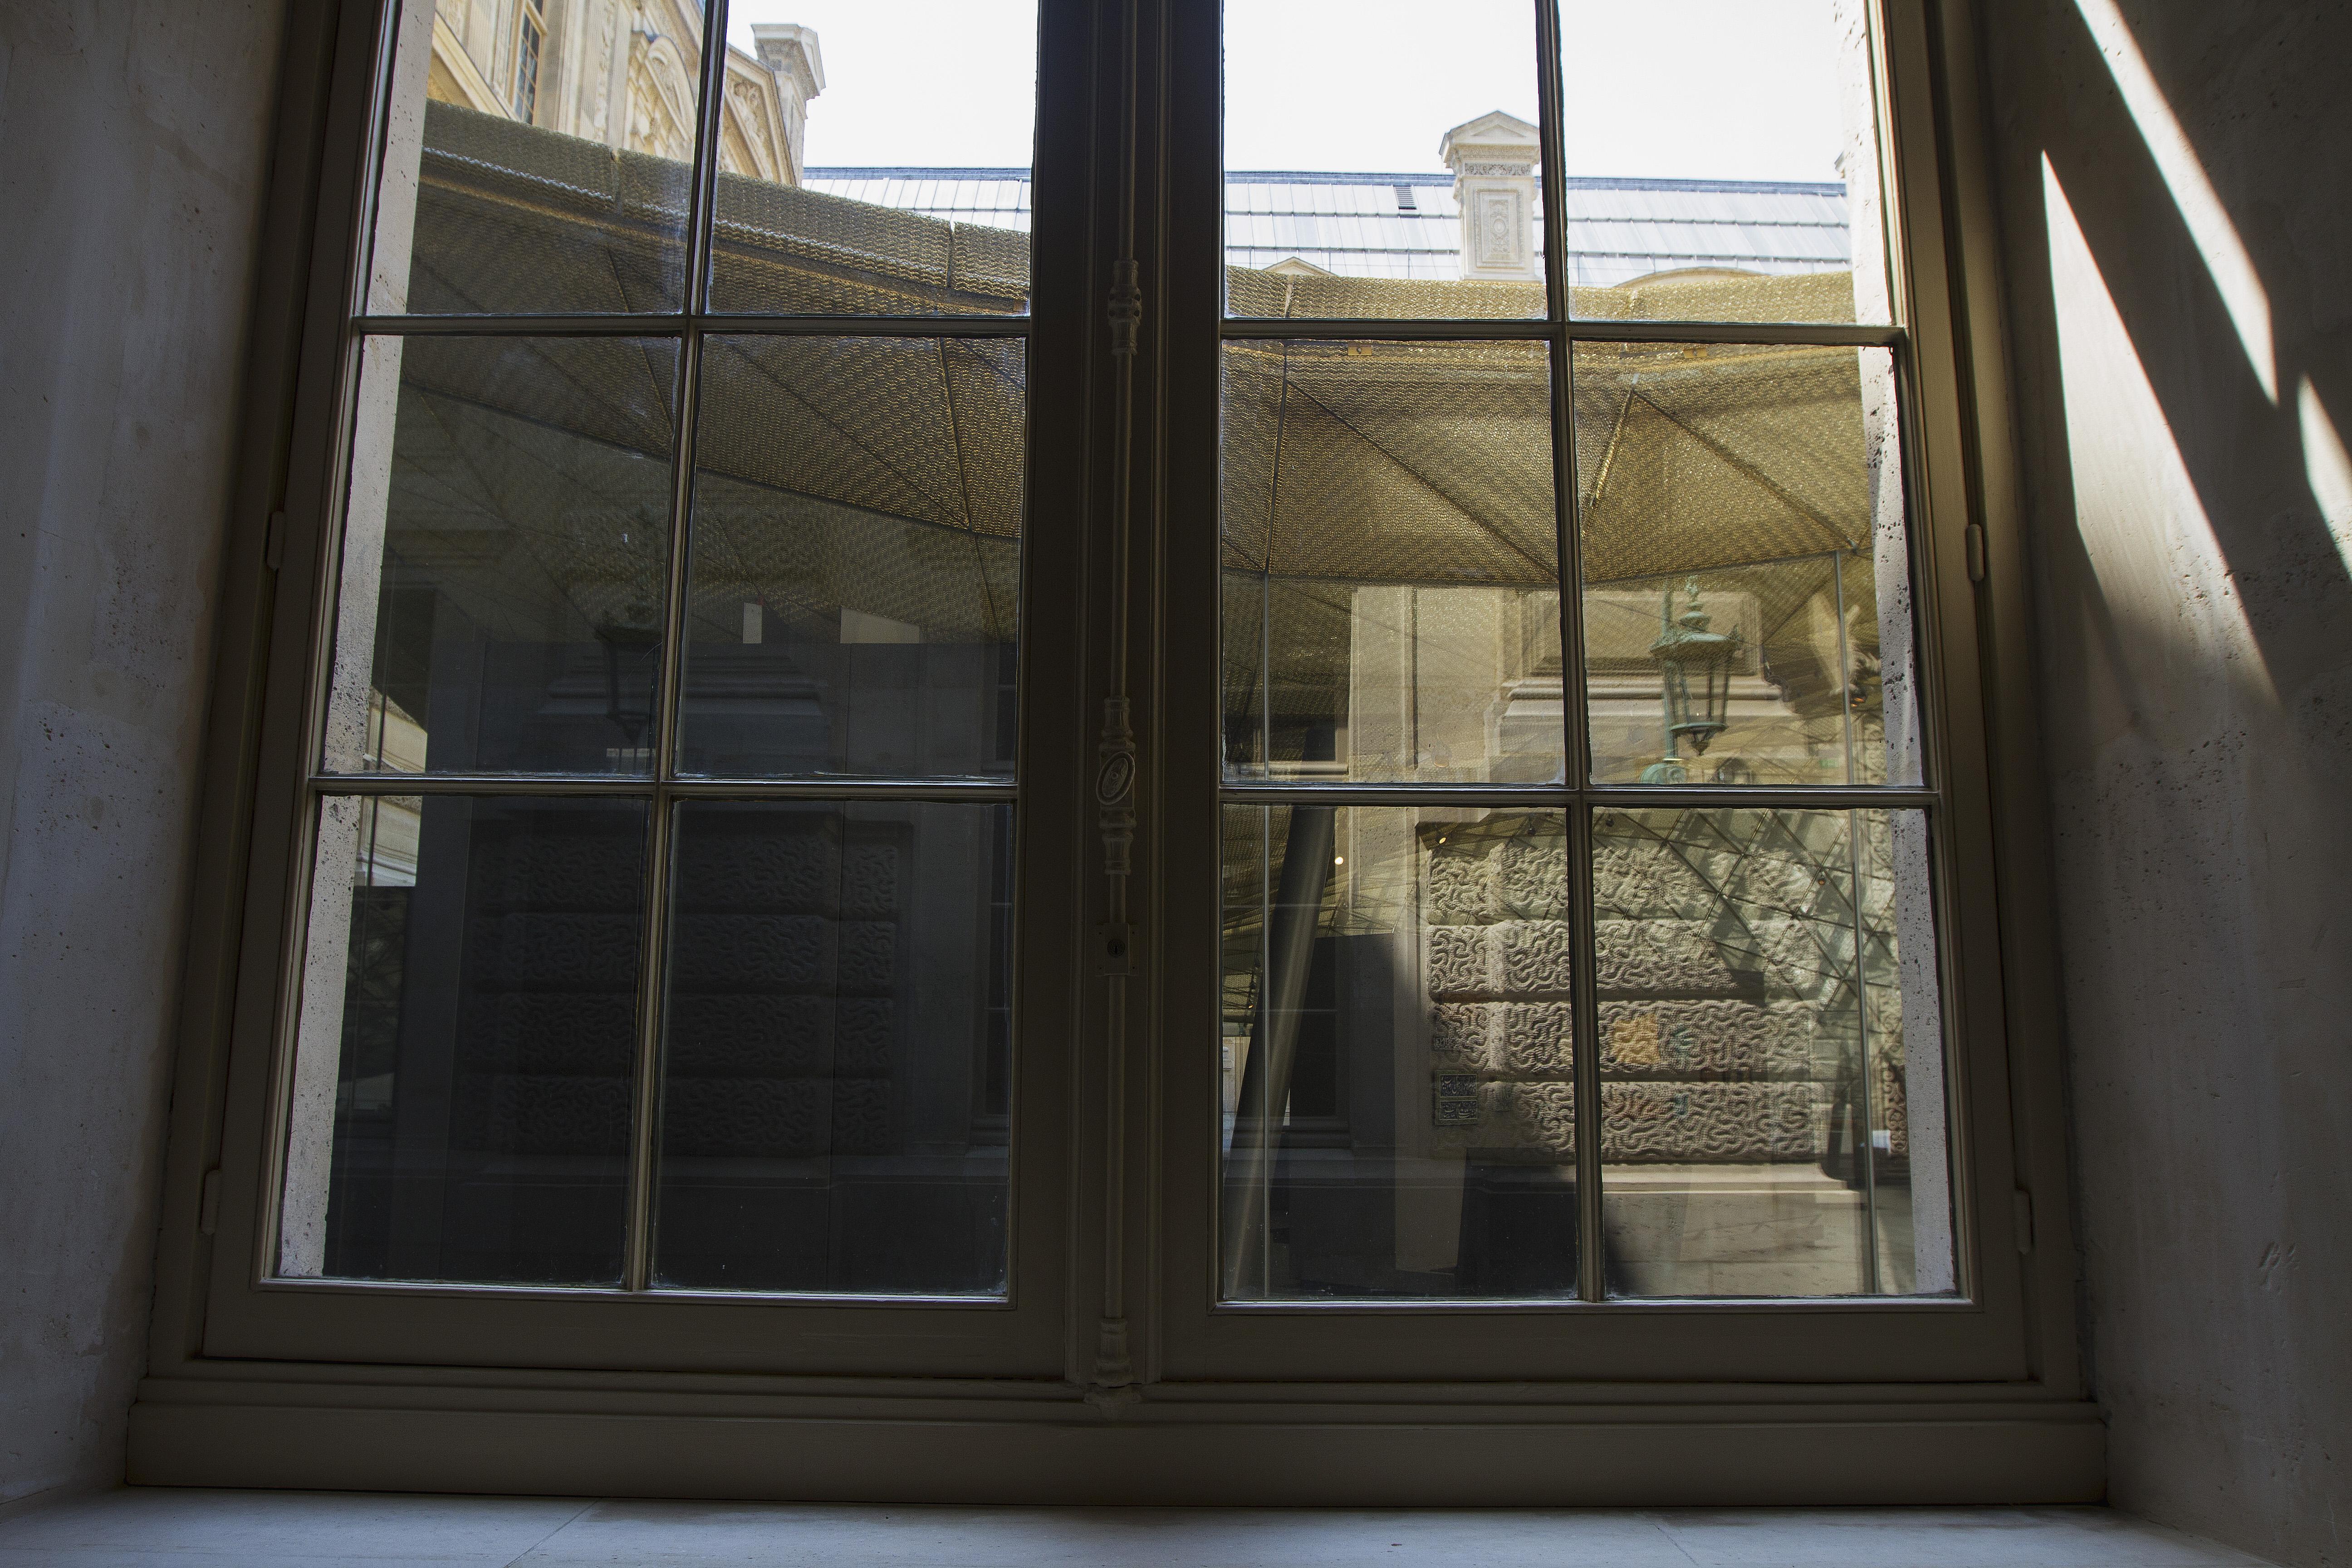 16_Louvre_IMG_4606_raw_edit_more daylight_printready_111%